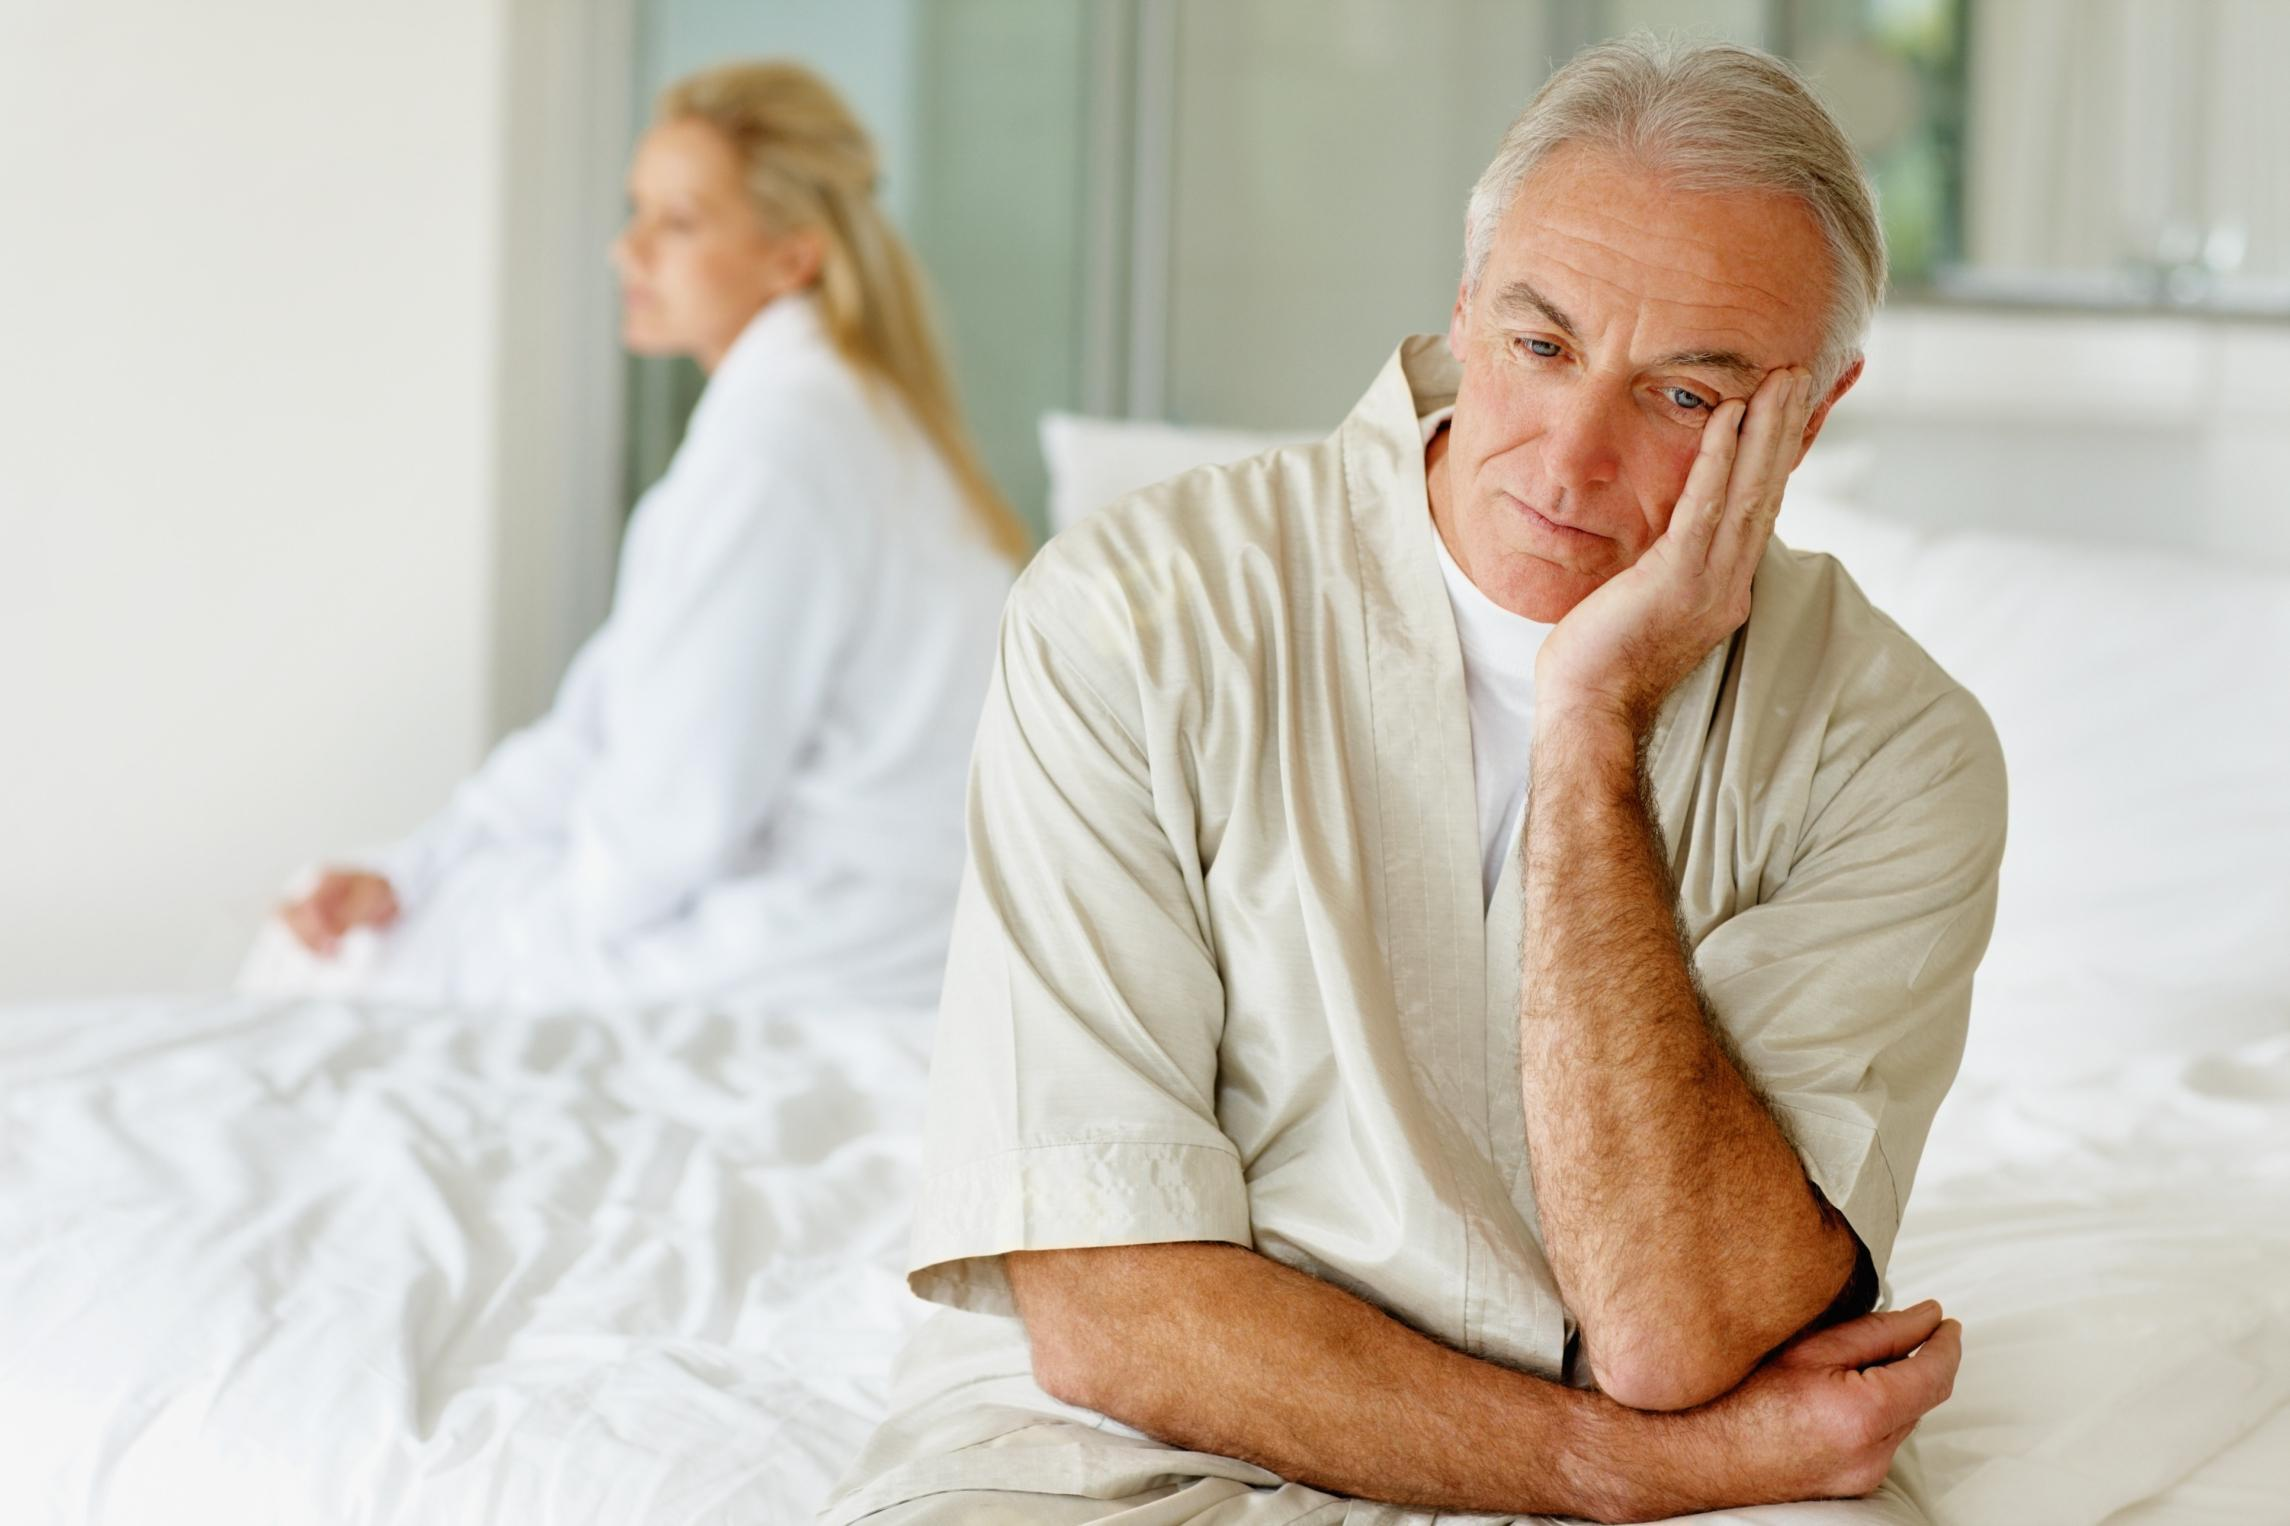 Existe Menopausa Masculina?